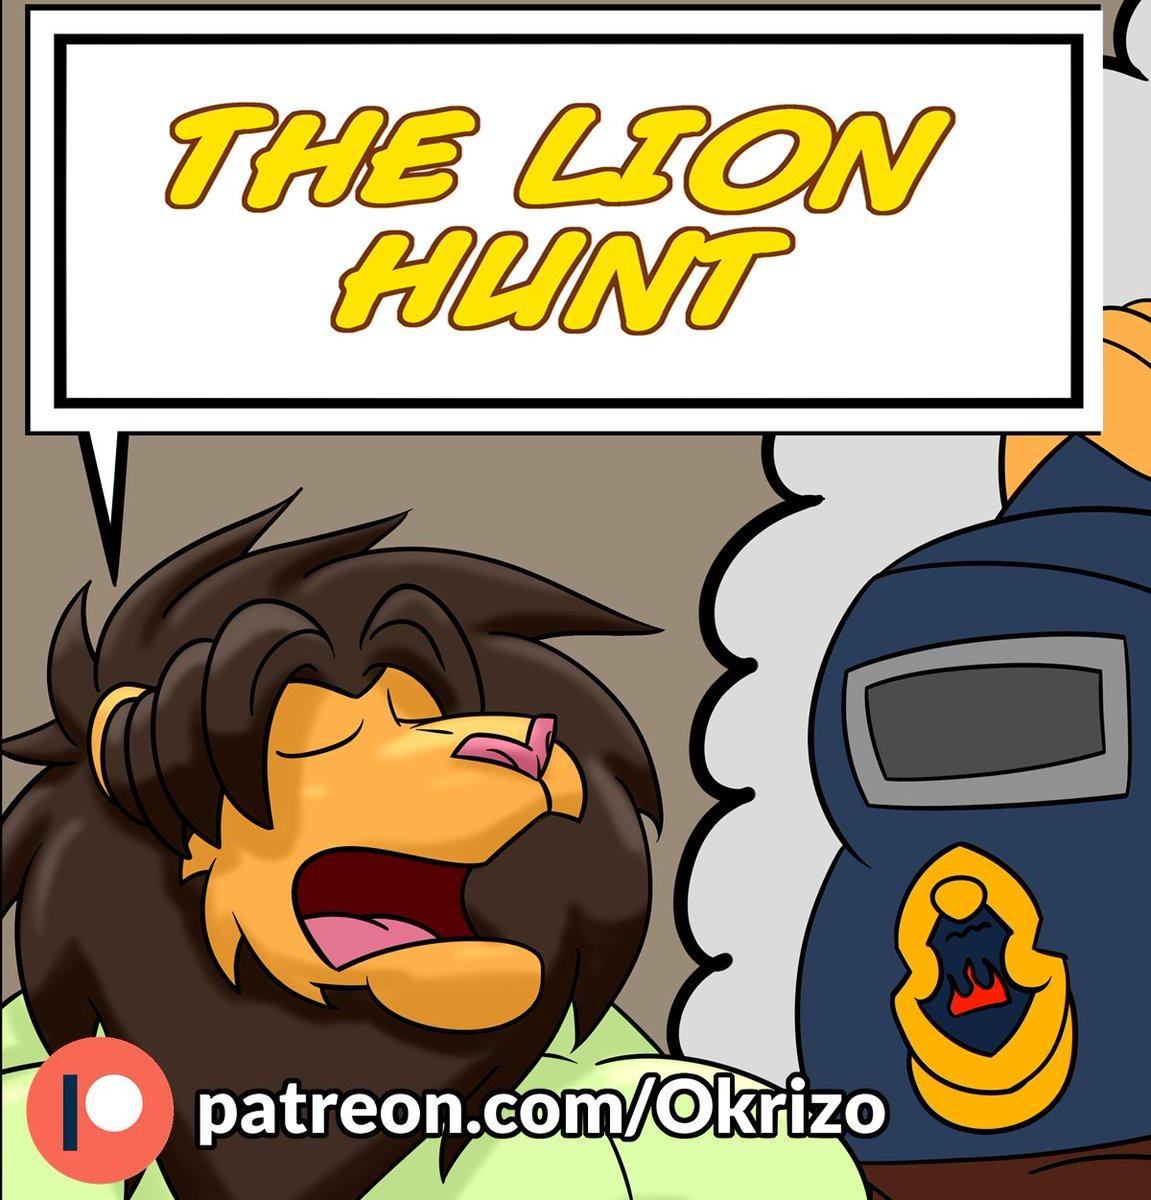 The lion hunt pagina 3 ya disponible en patreon ^^ patreon.com/Okrizo